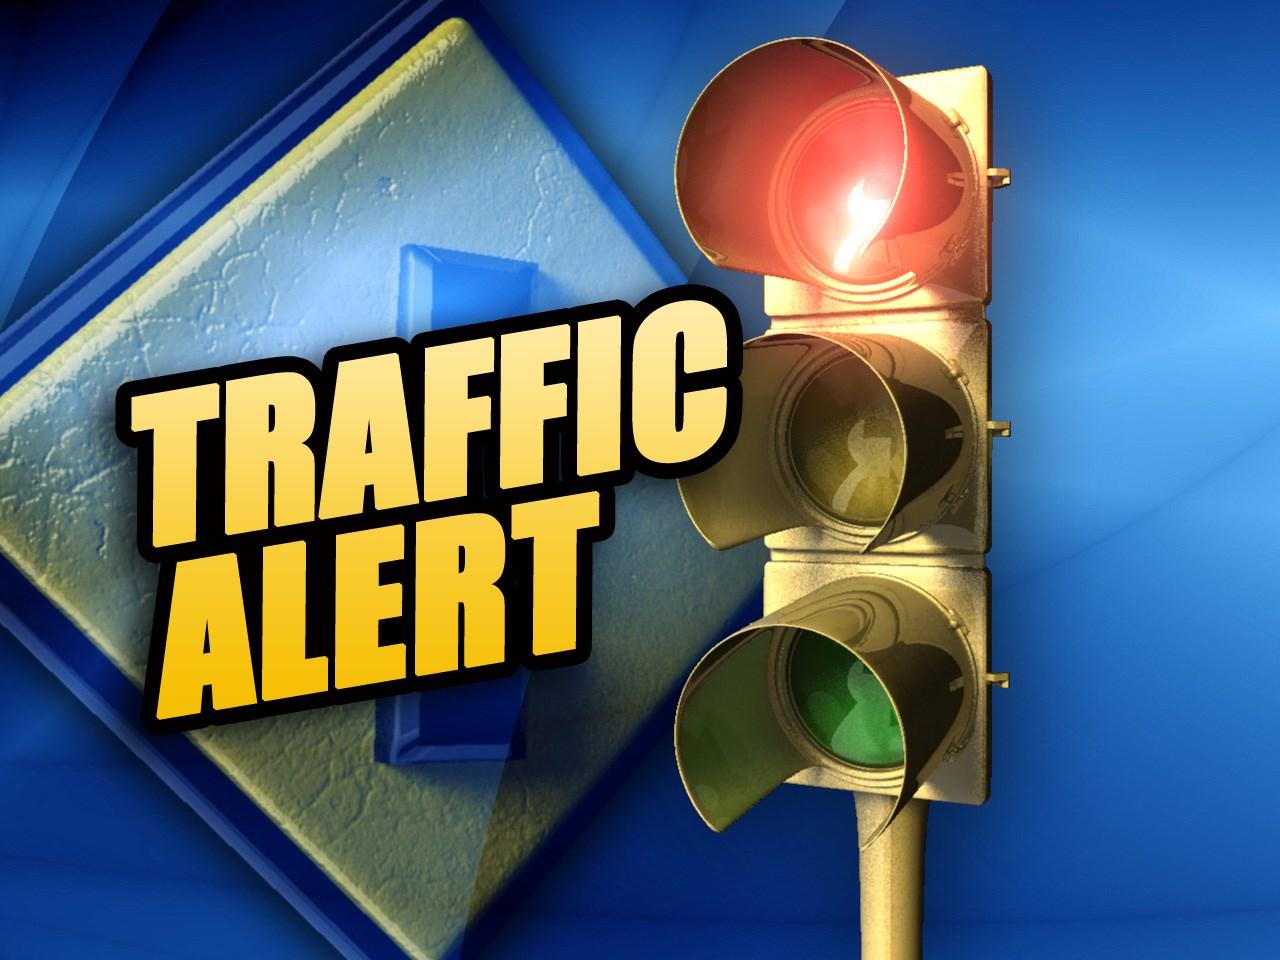 Intermittent full closure on SR 62 Sunday night